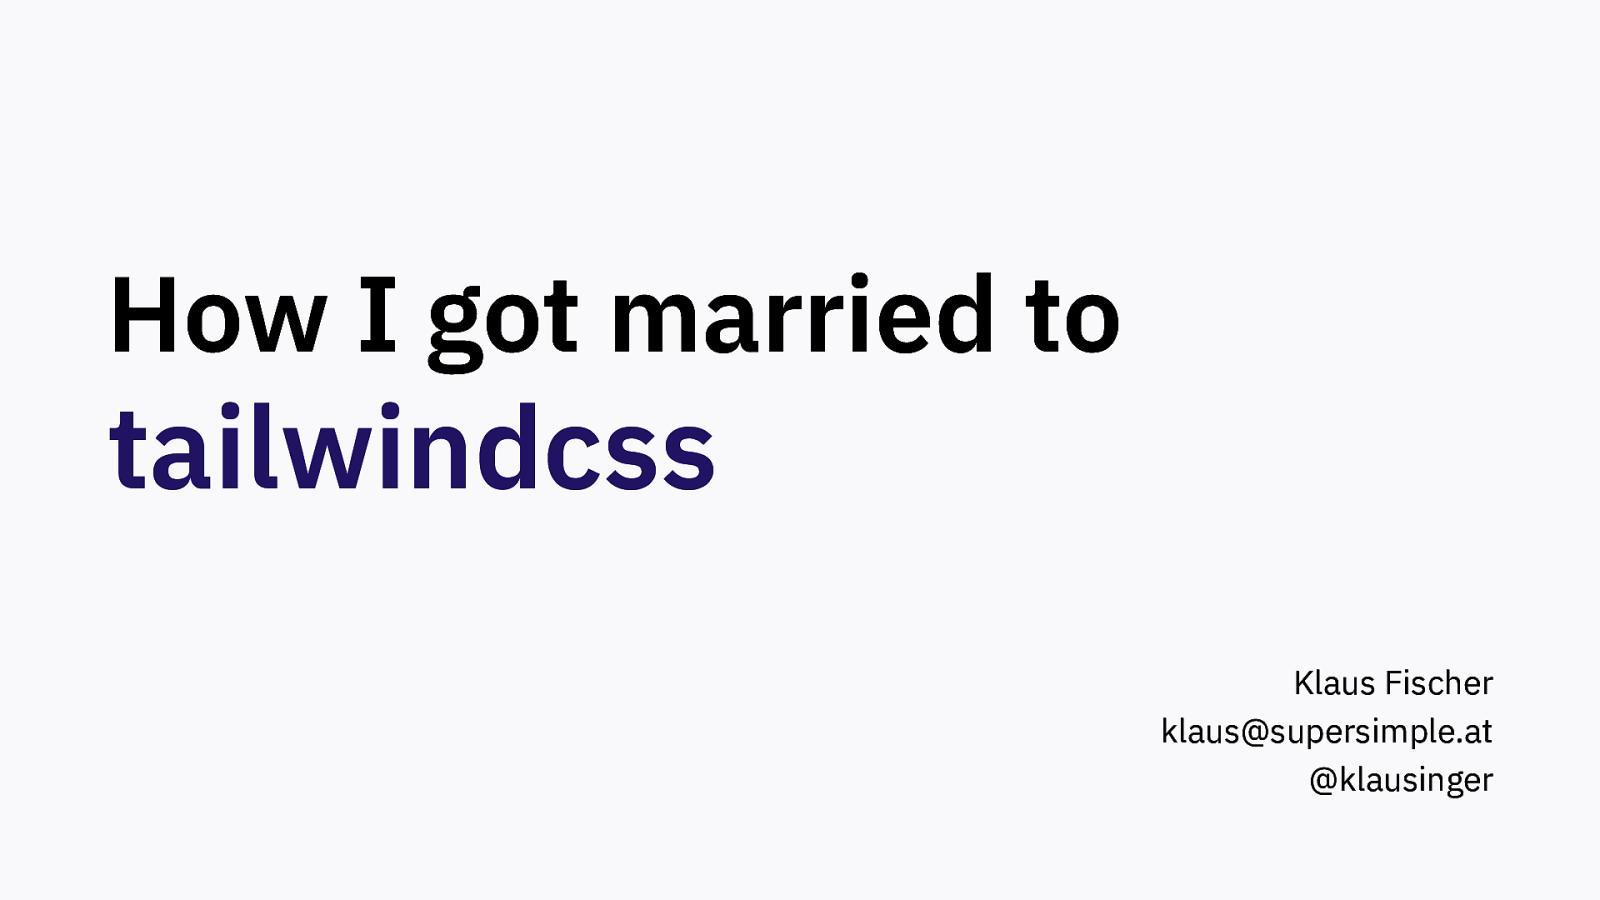 How I got married to tailwindcss